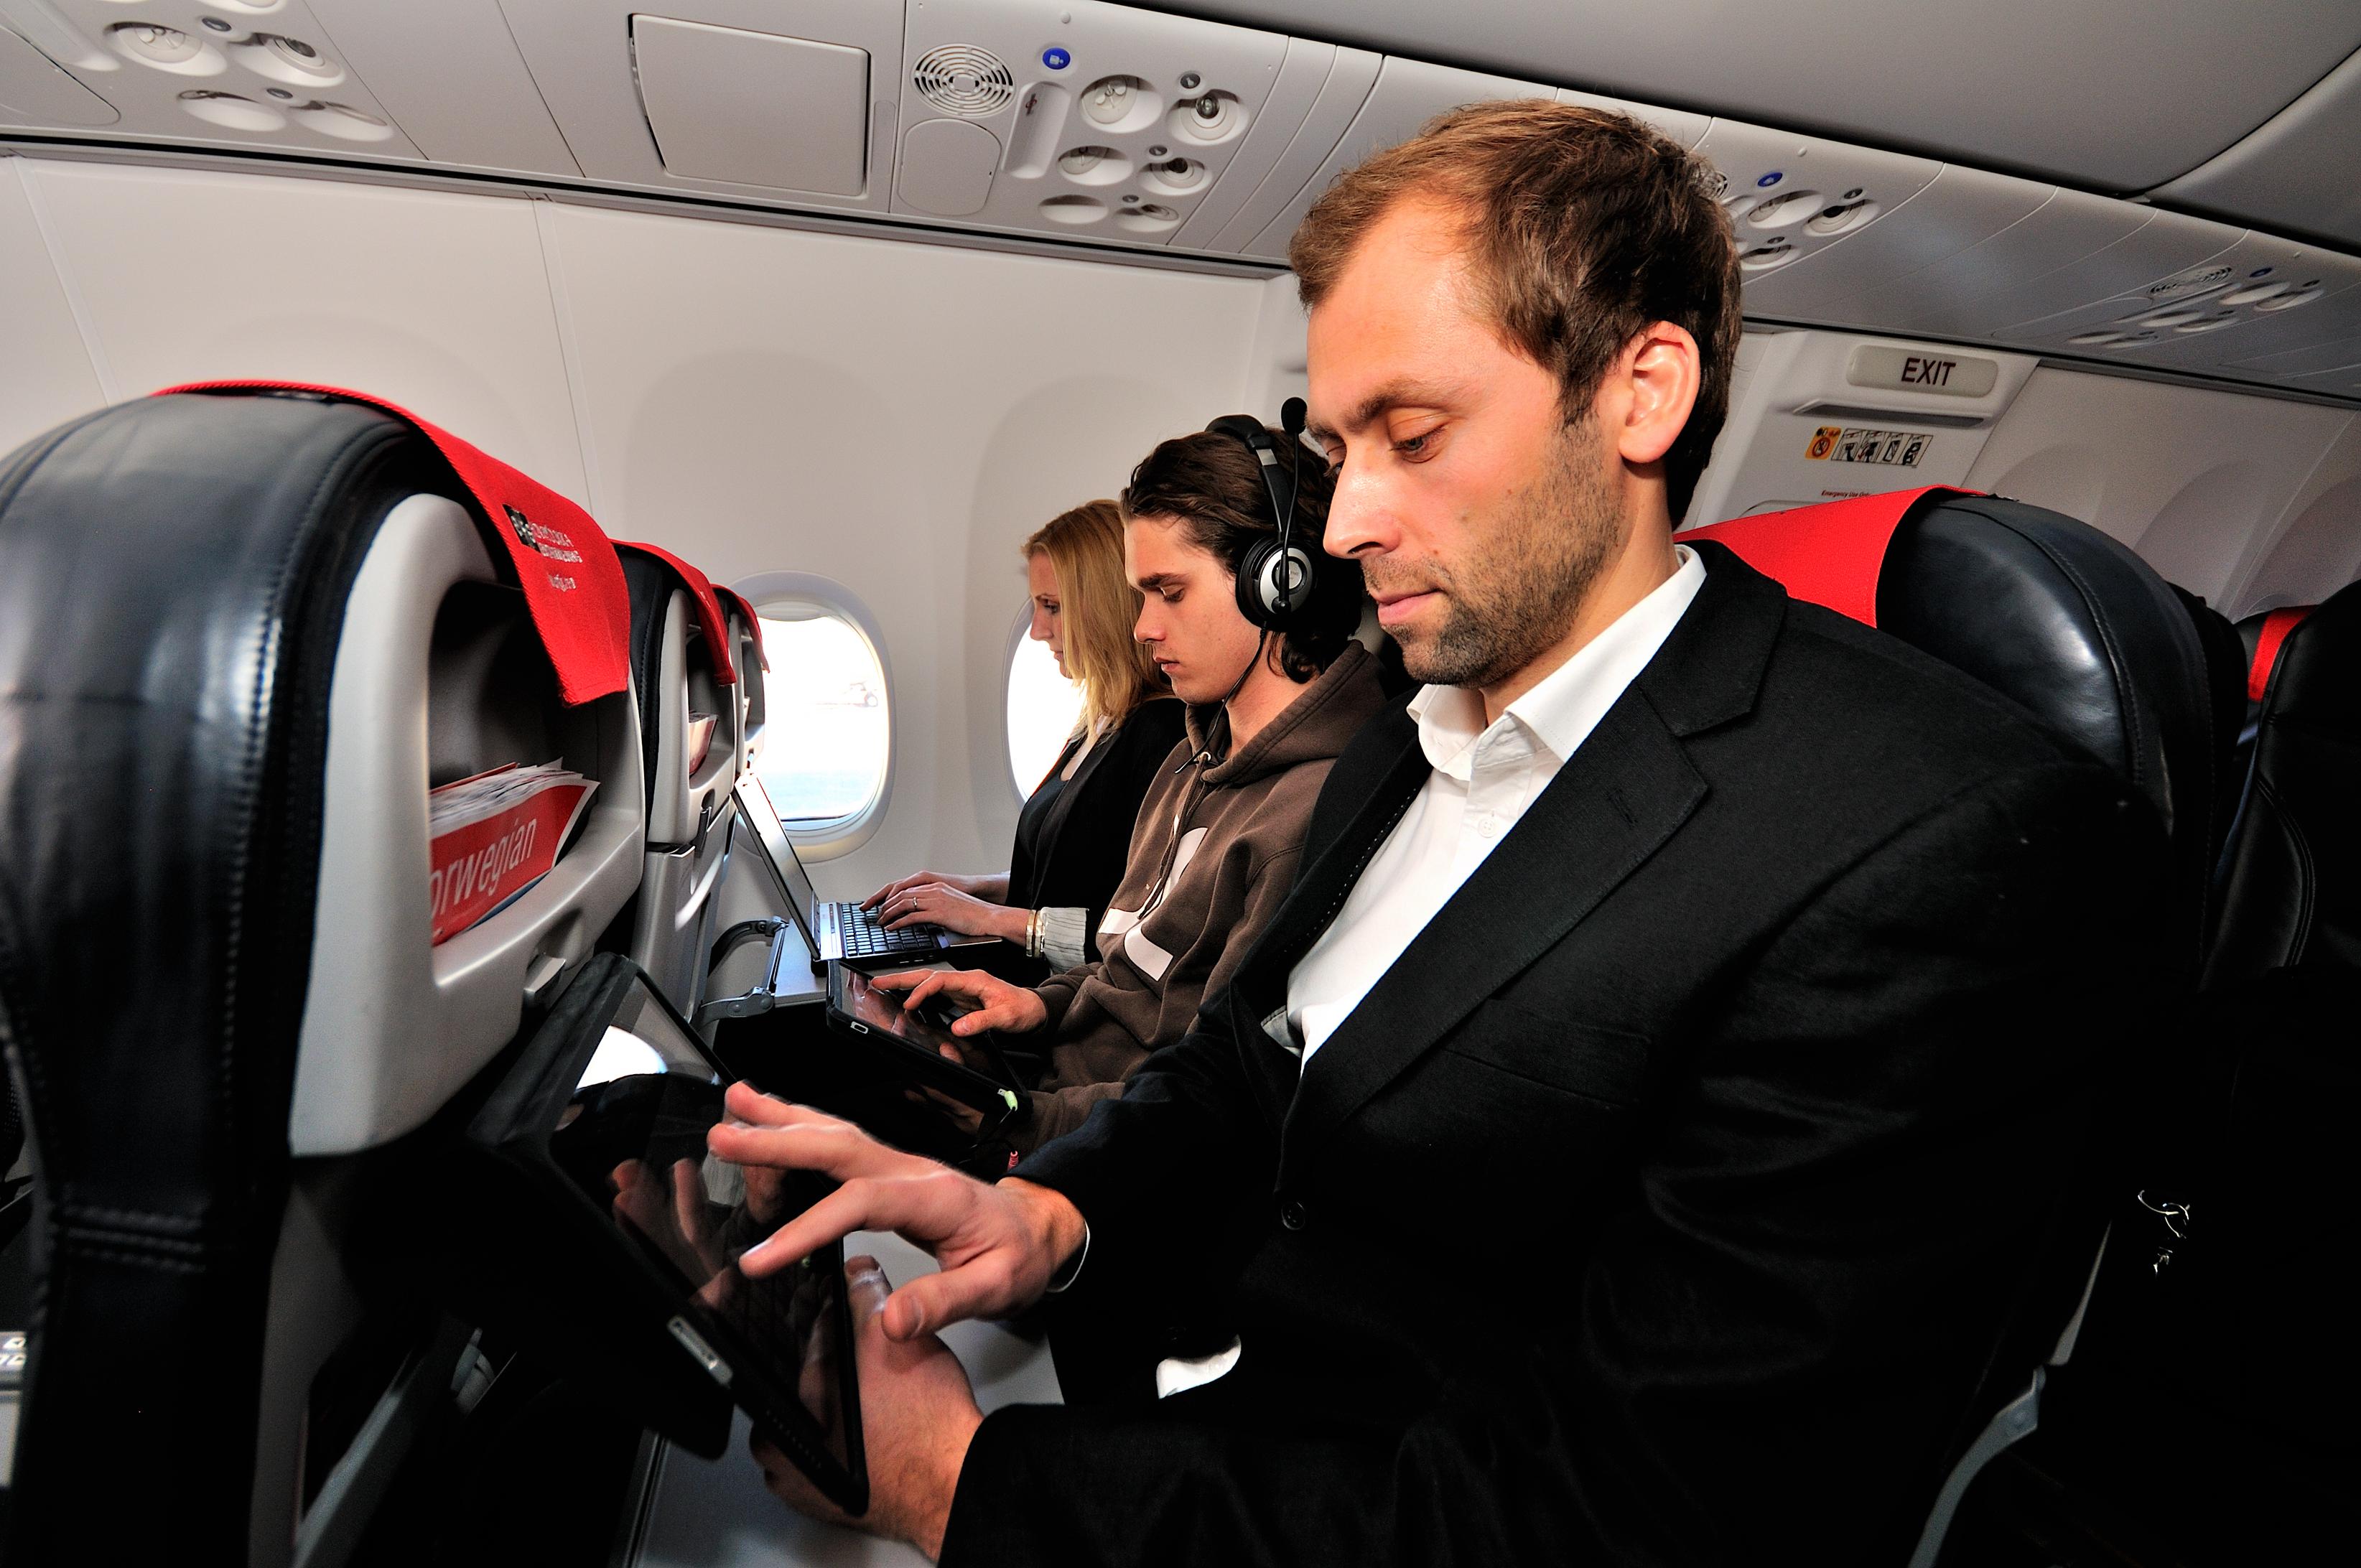 Free WiFi aboard Norwegian Air